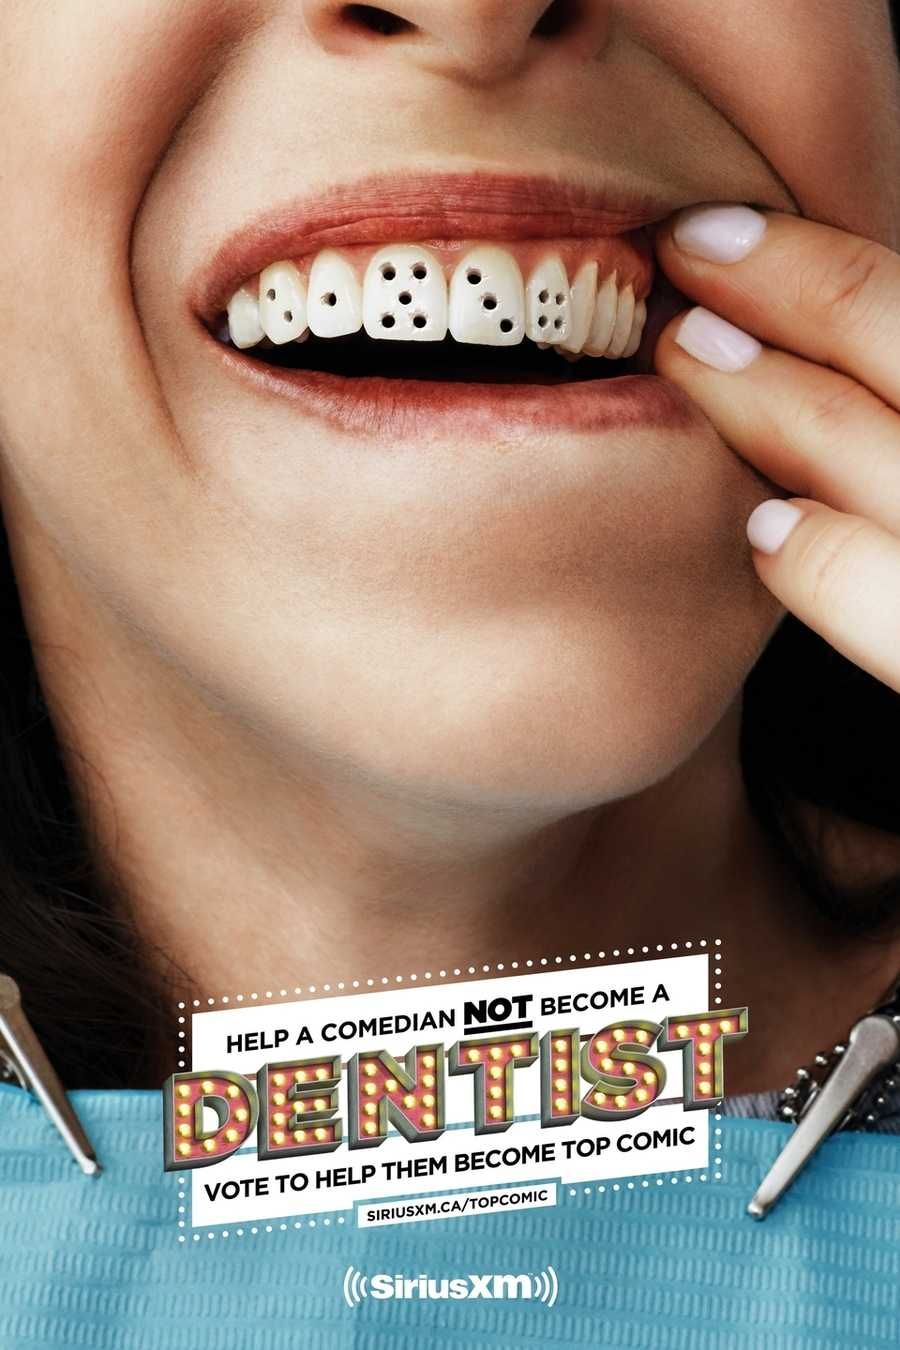 agenesia dental del diente de leche de starbucks